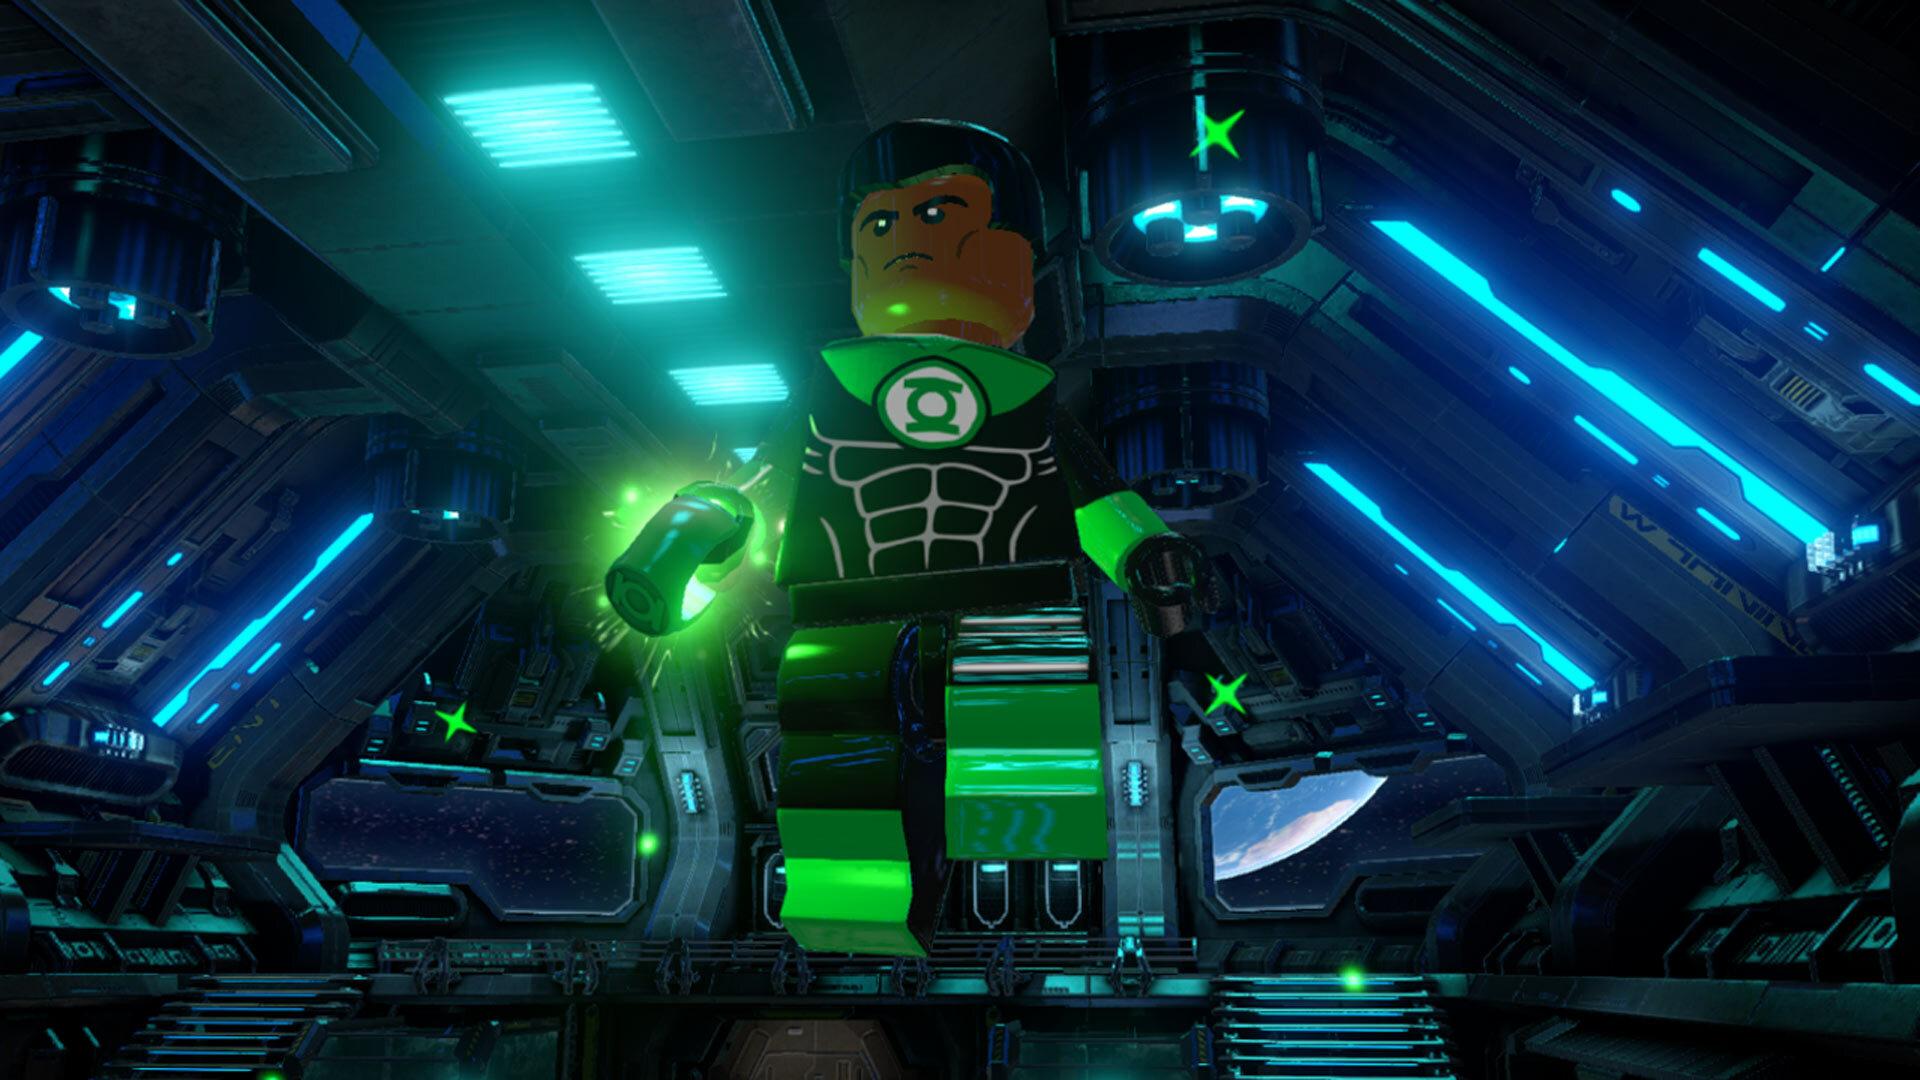 lego-batman-3-beyond-gotham-pc-screenshot-01